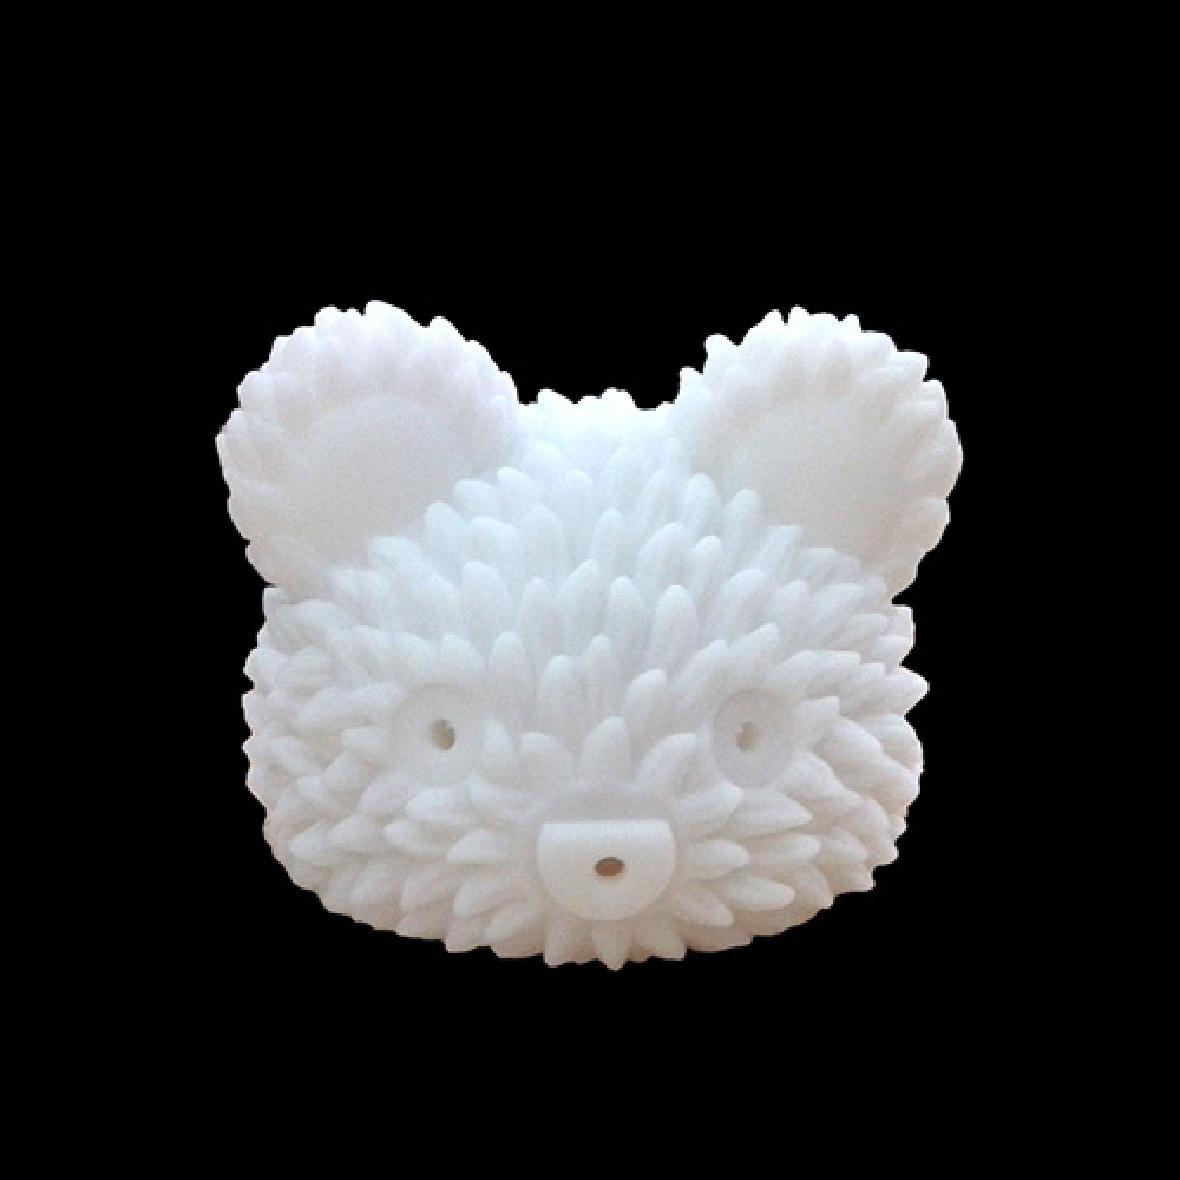 3D模型打印技术